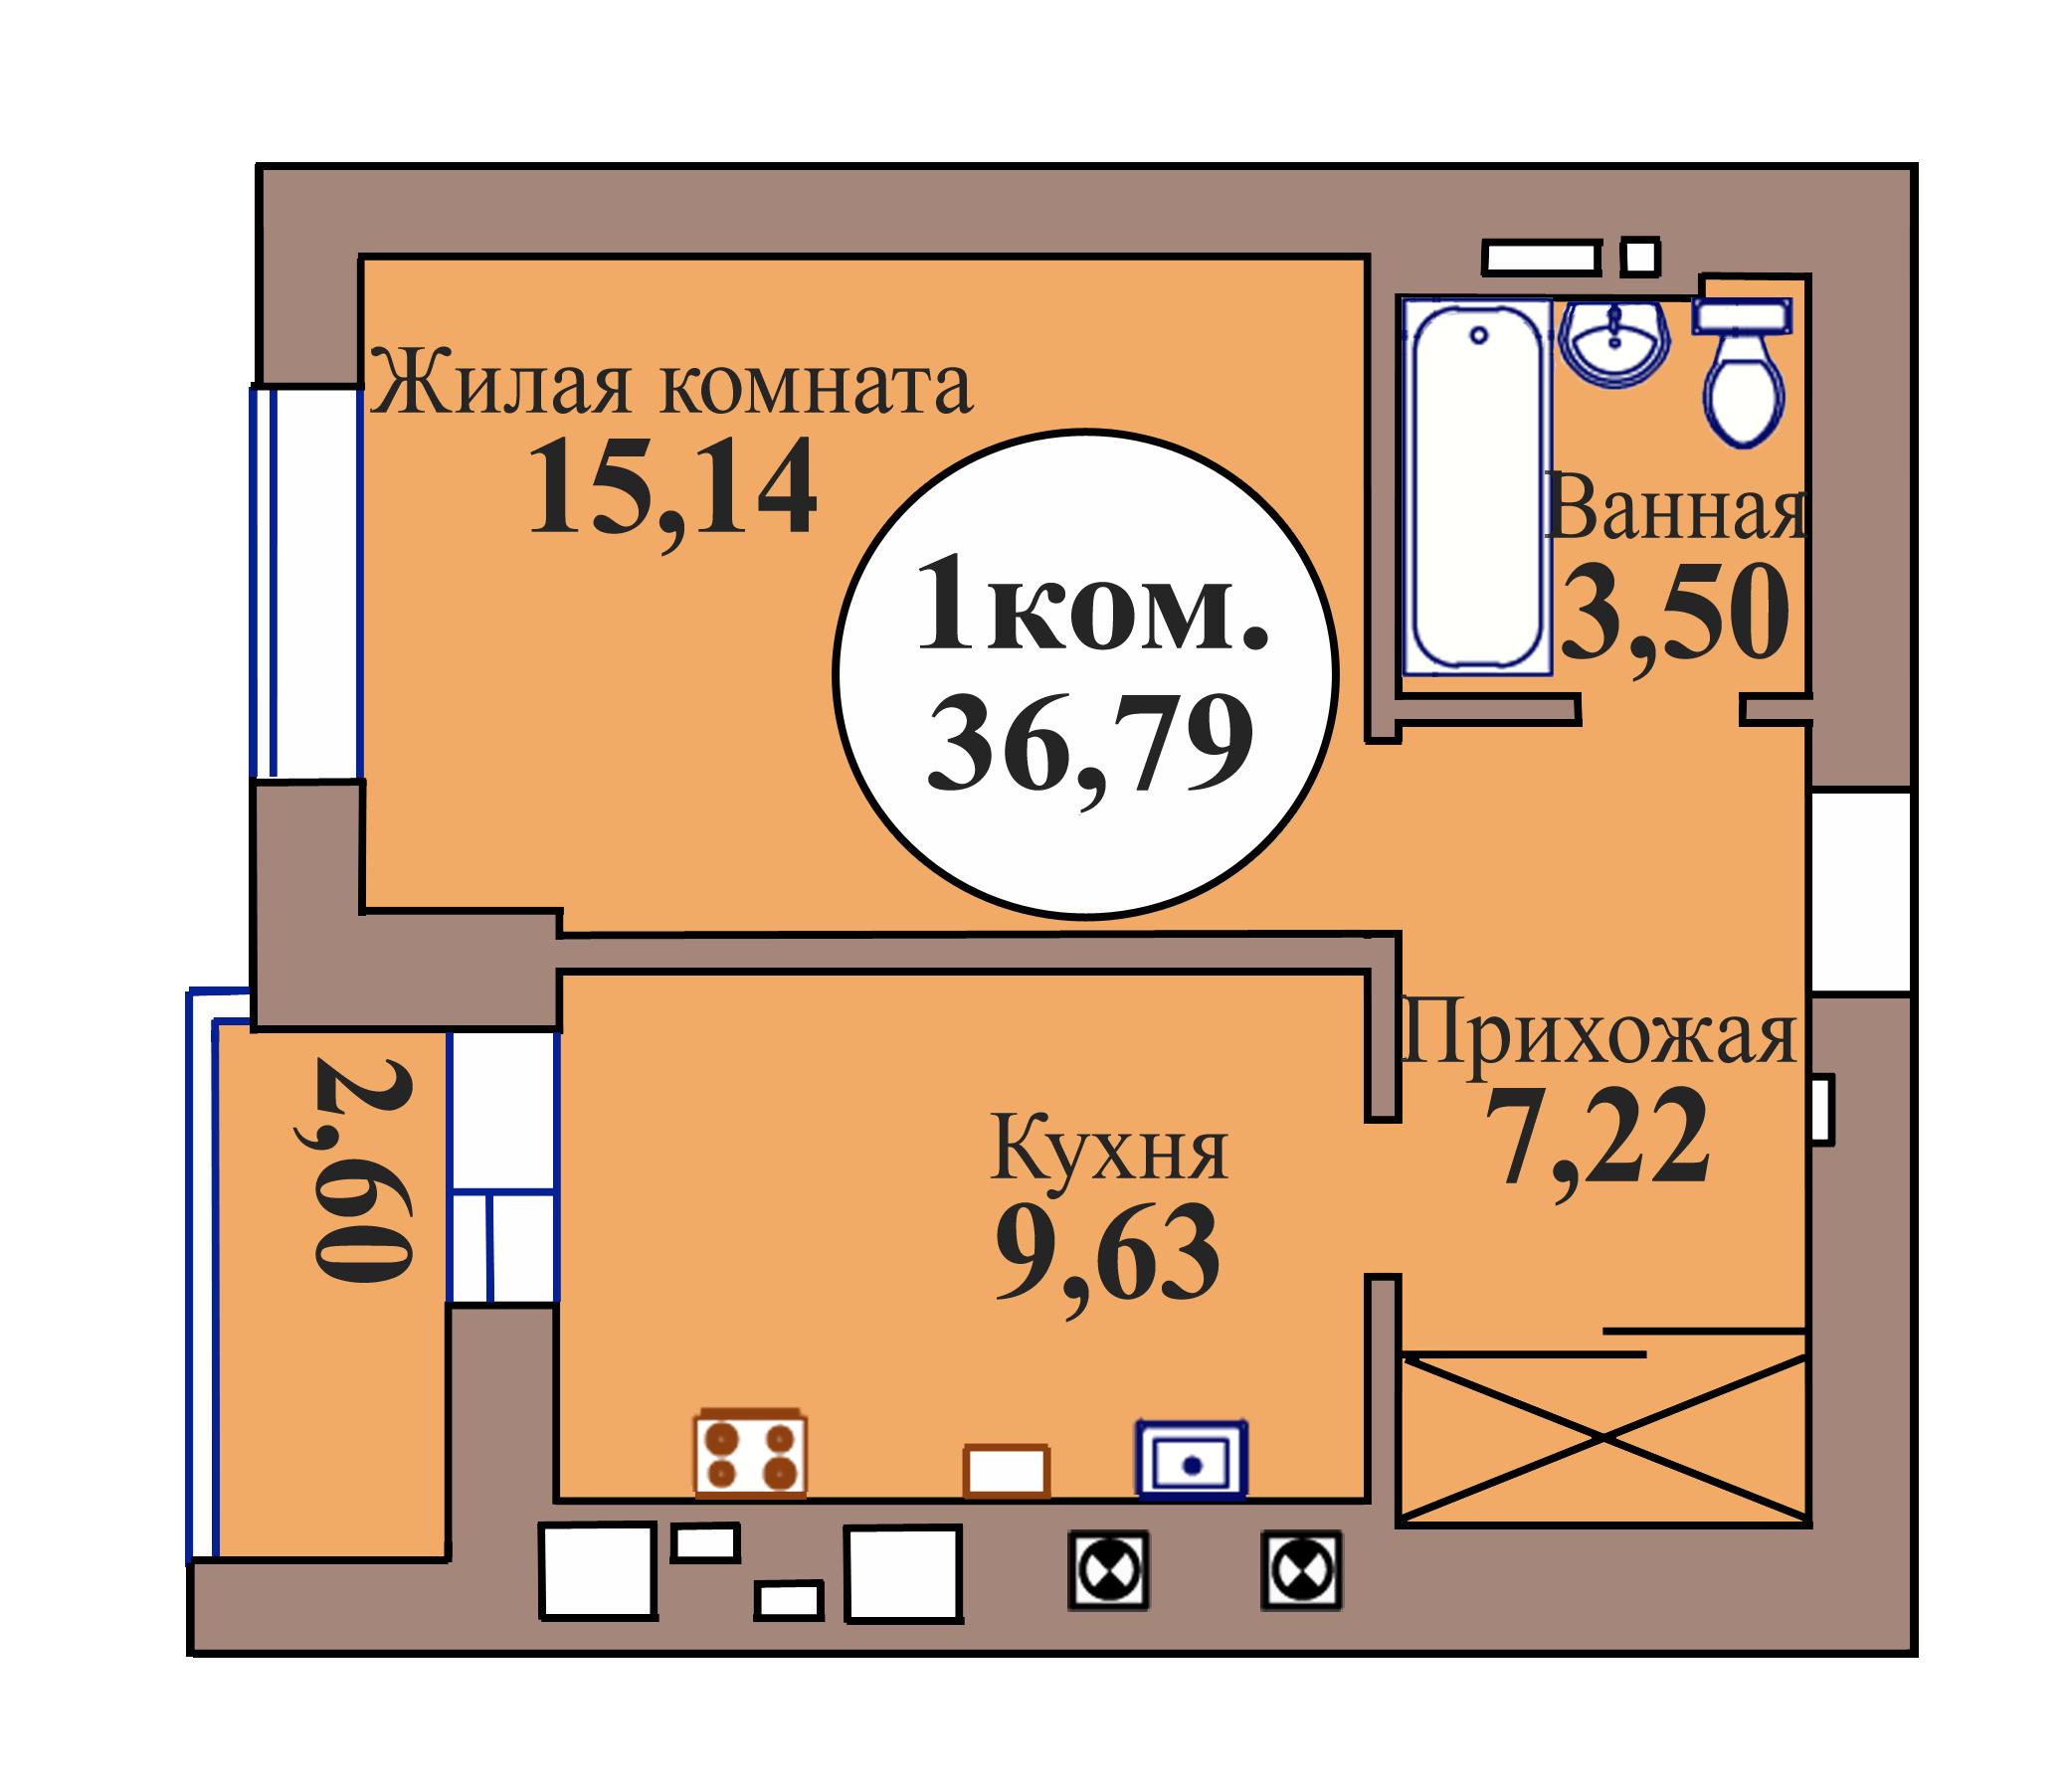 1-комн. кв. по пер. Калининградский, 5 кв. 77 в Калининграде